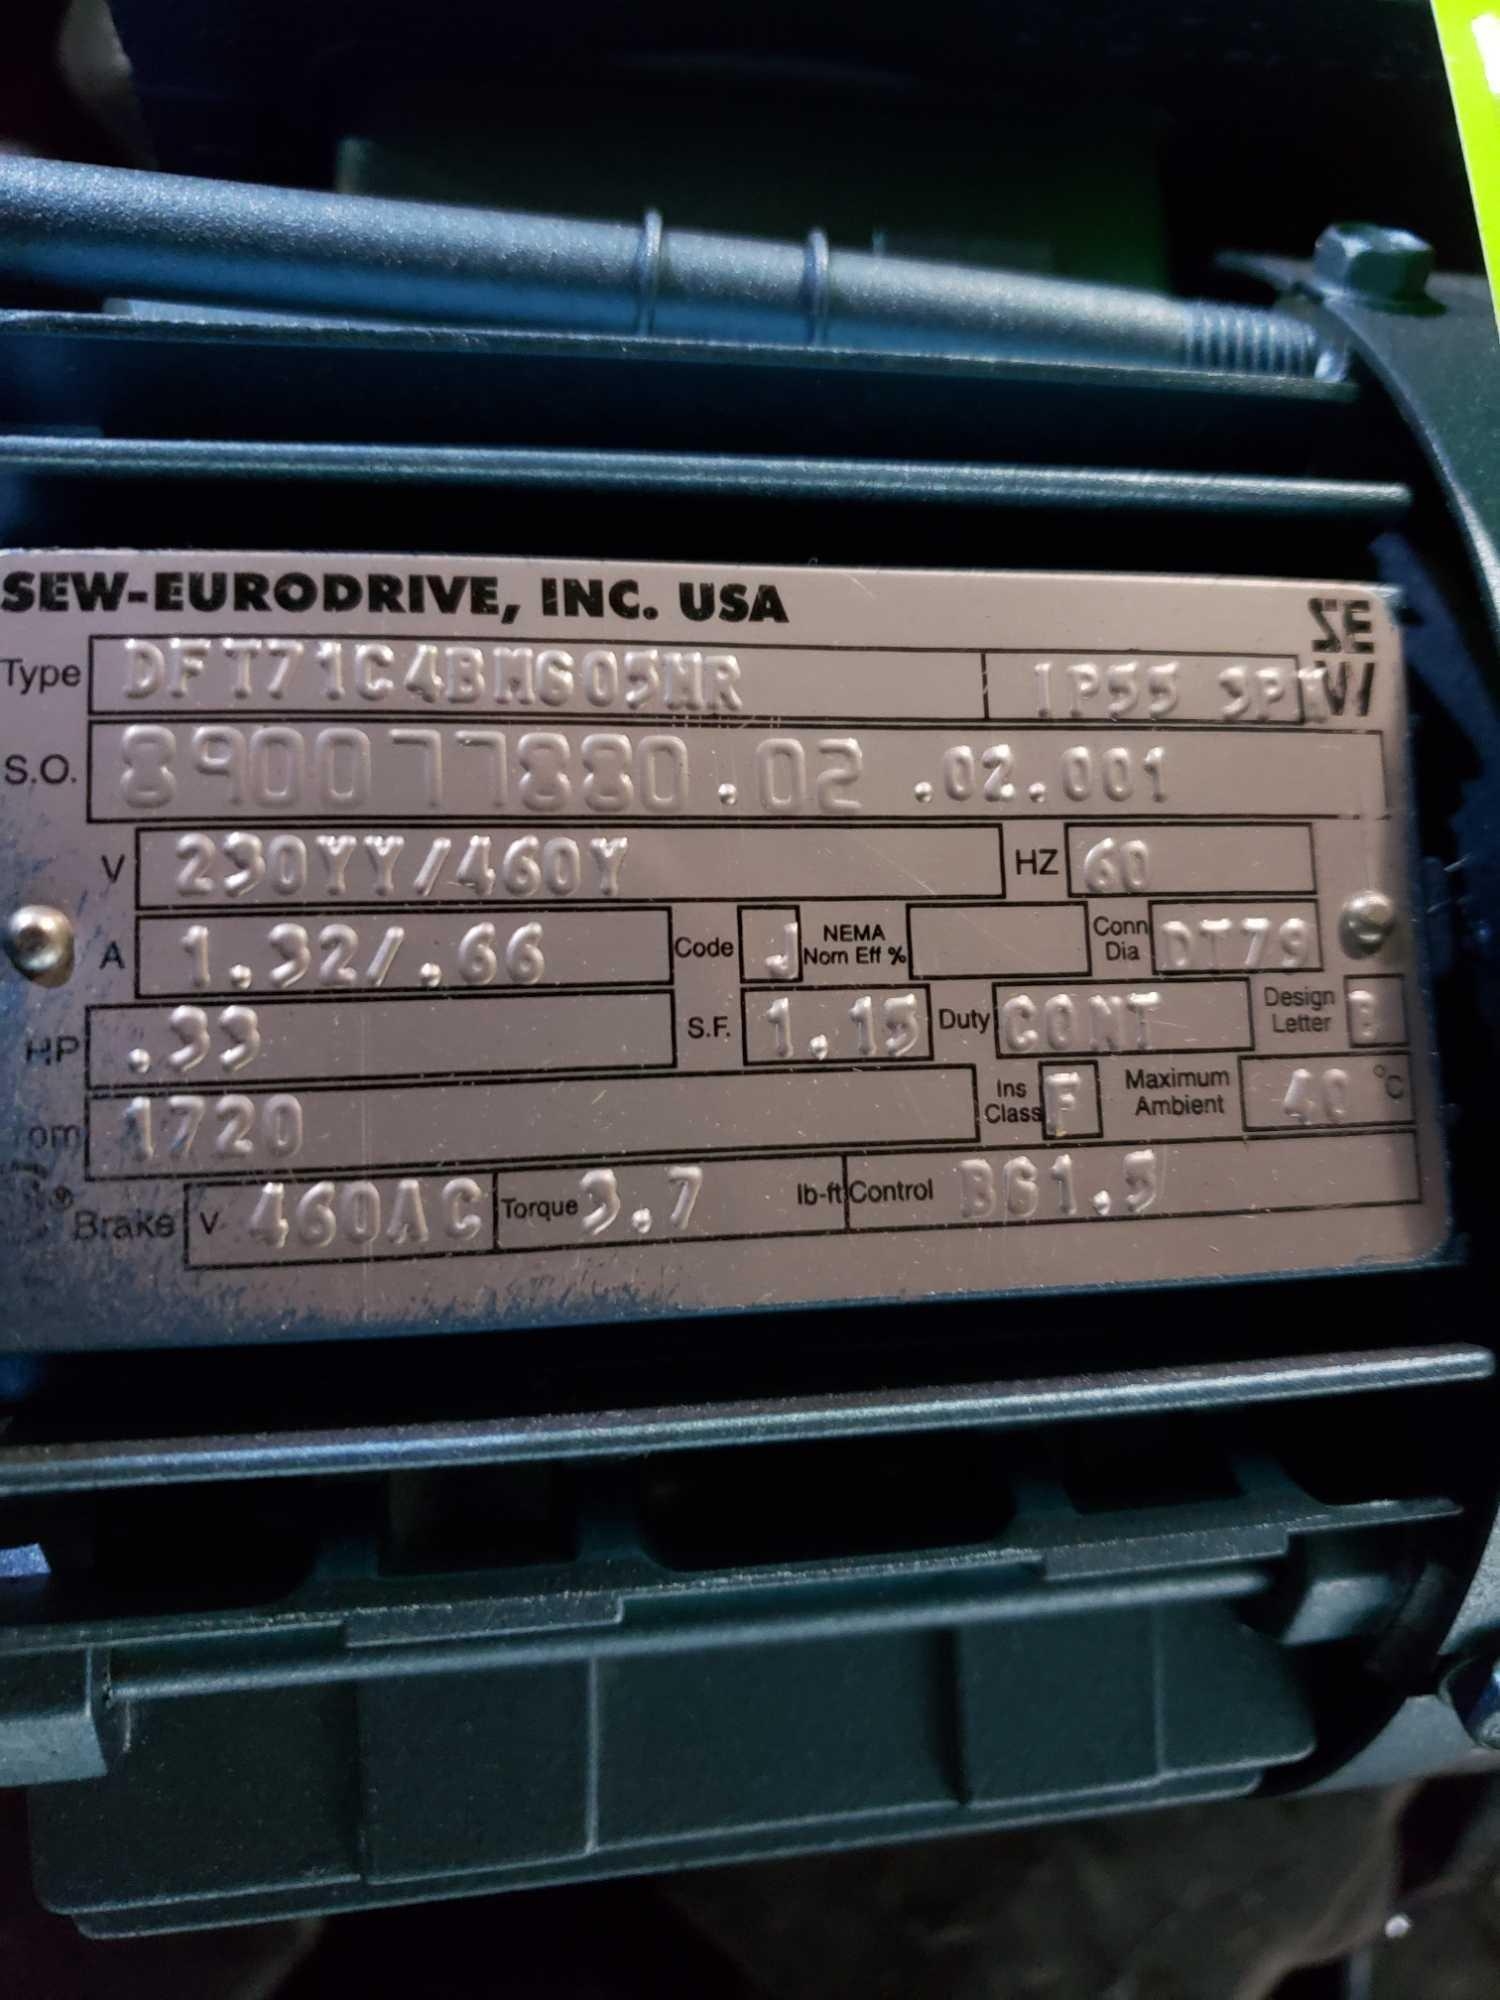 Lot 34 - Sew Eurodrive gearmotor assembly. Models RF37DT71C4BM605HR and DFT71C4BM605HR. New with minor wear.